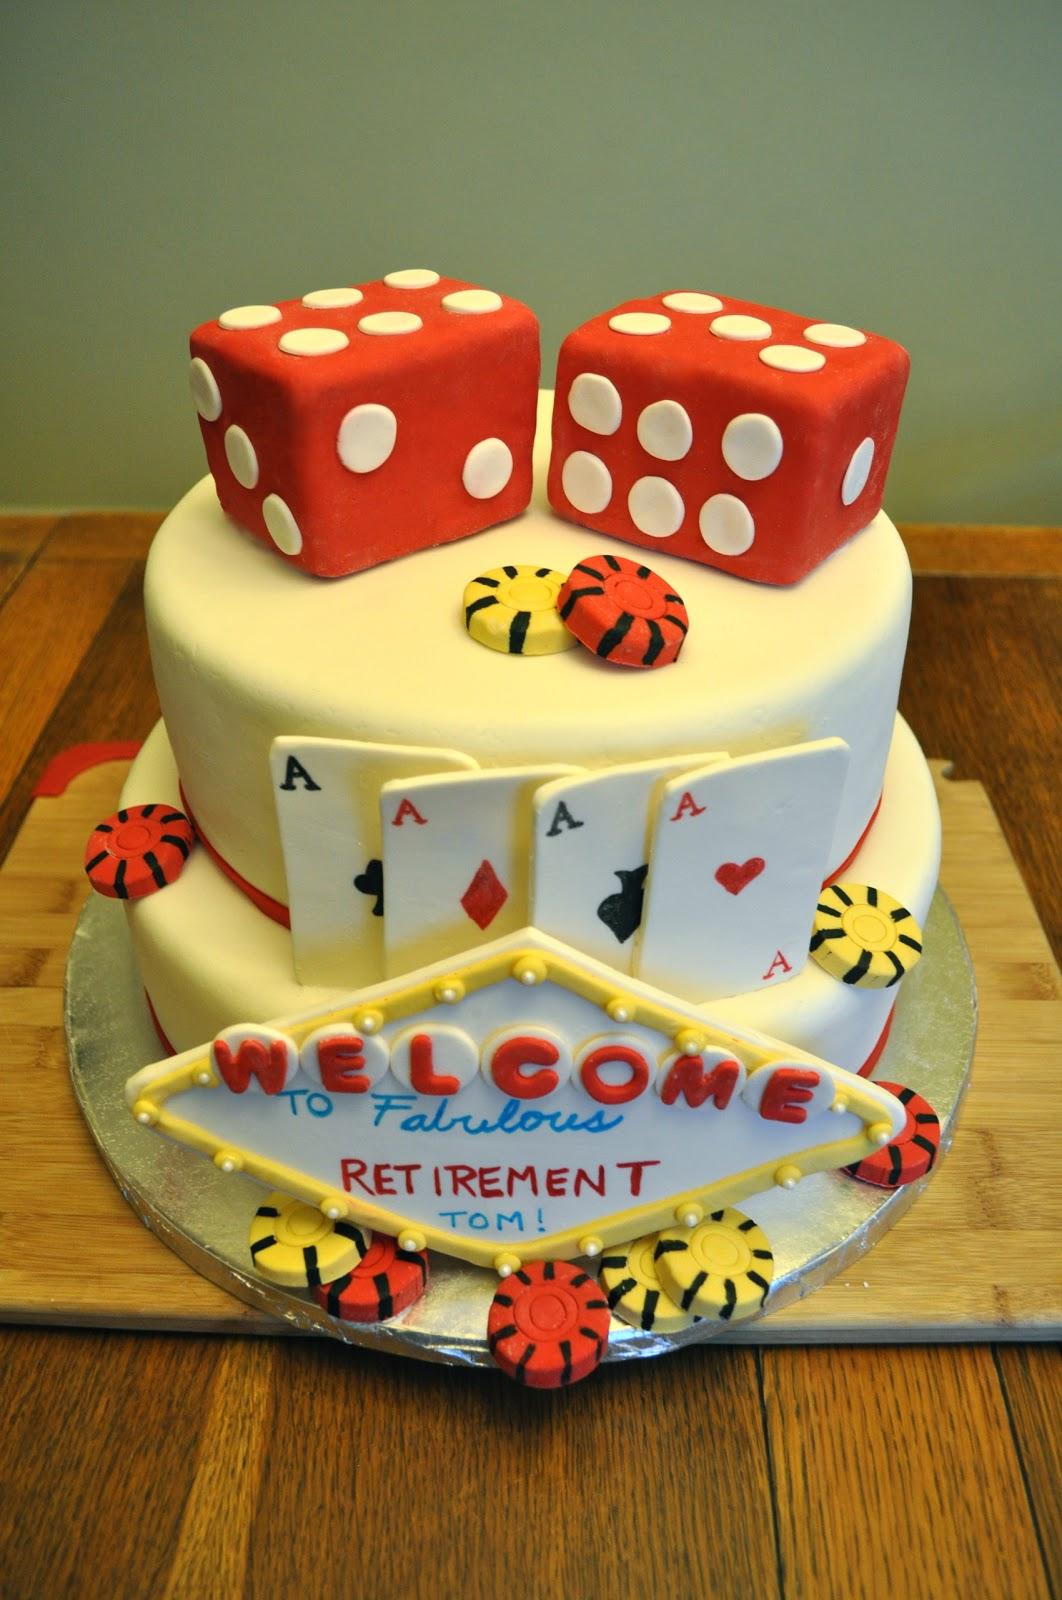 Cakes by Setia